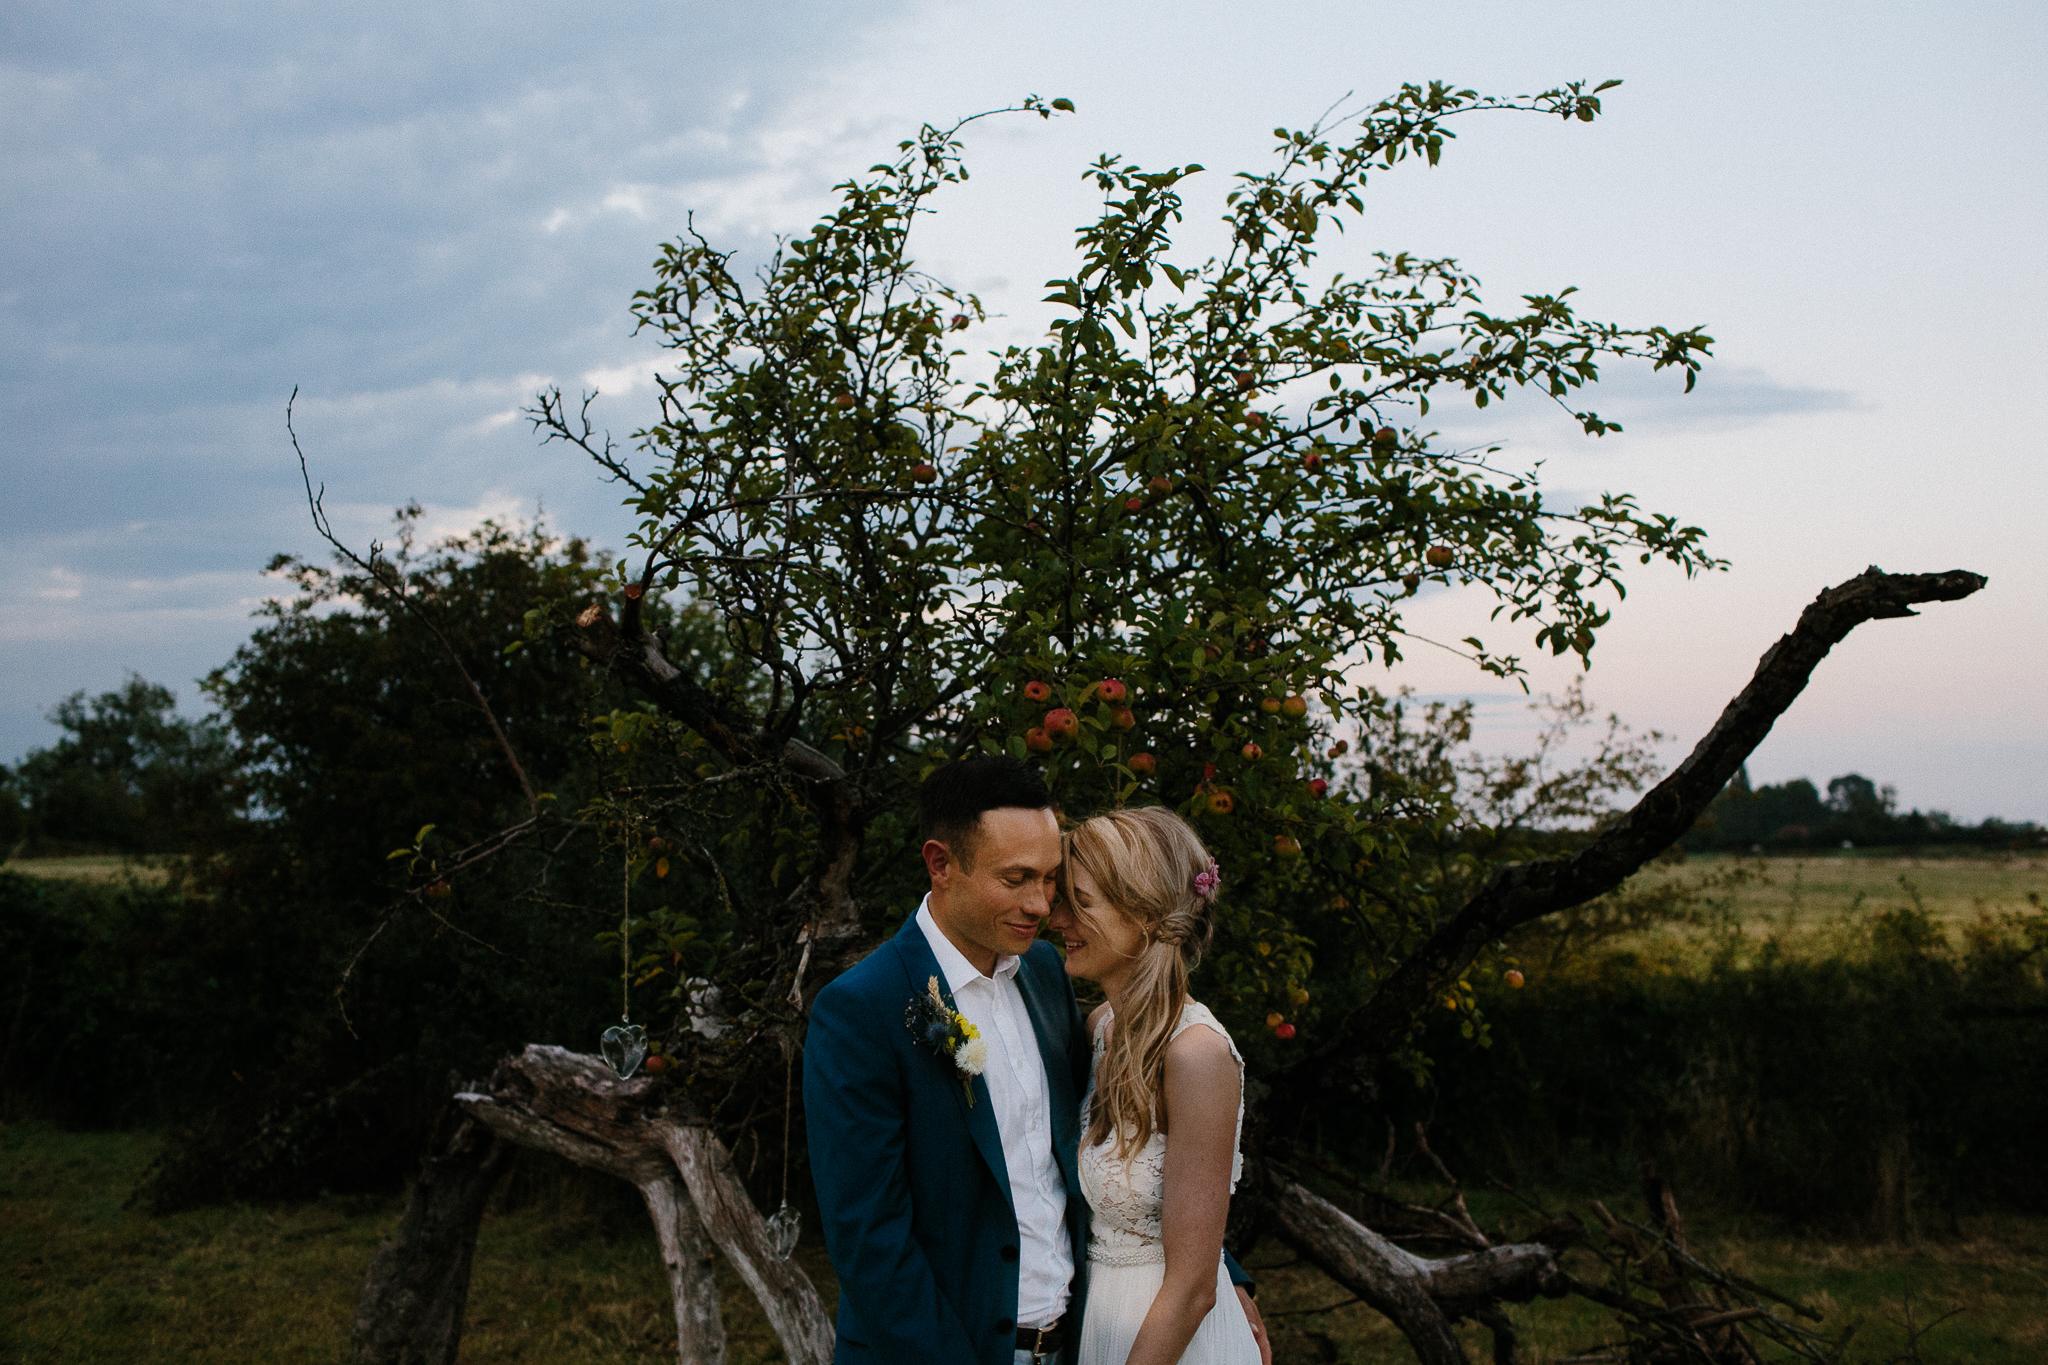 grantham_wedding_photographer-110.jpg